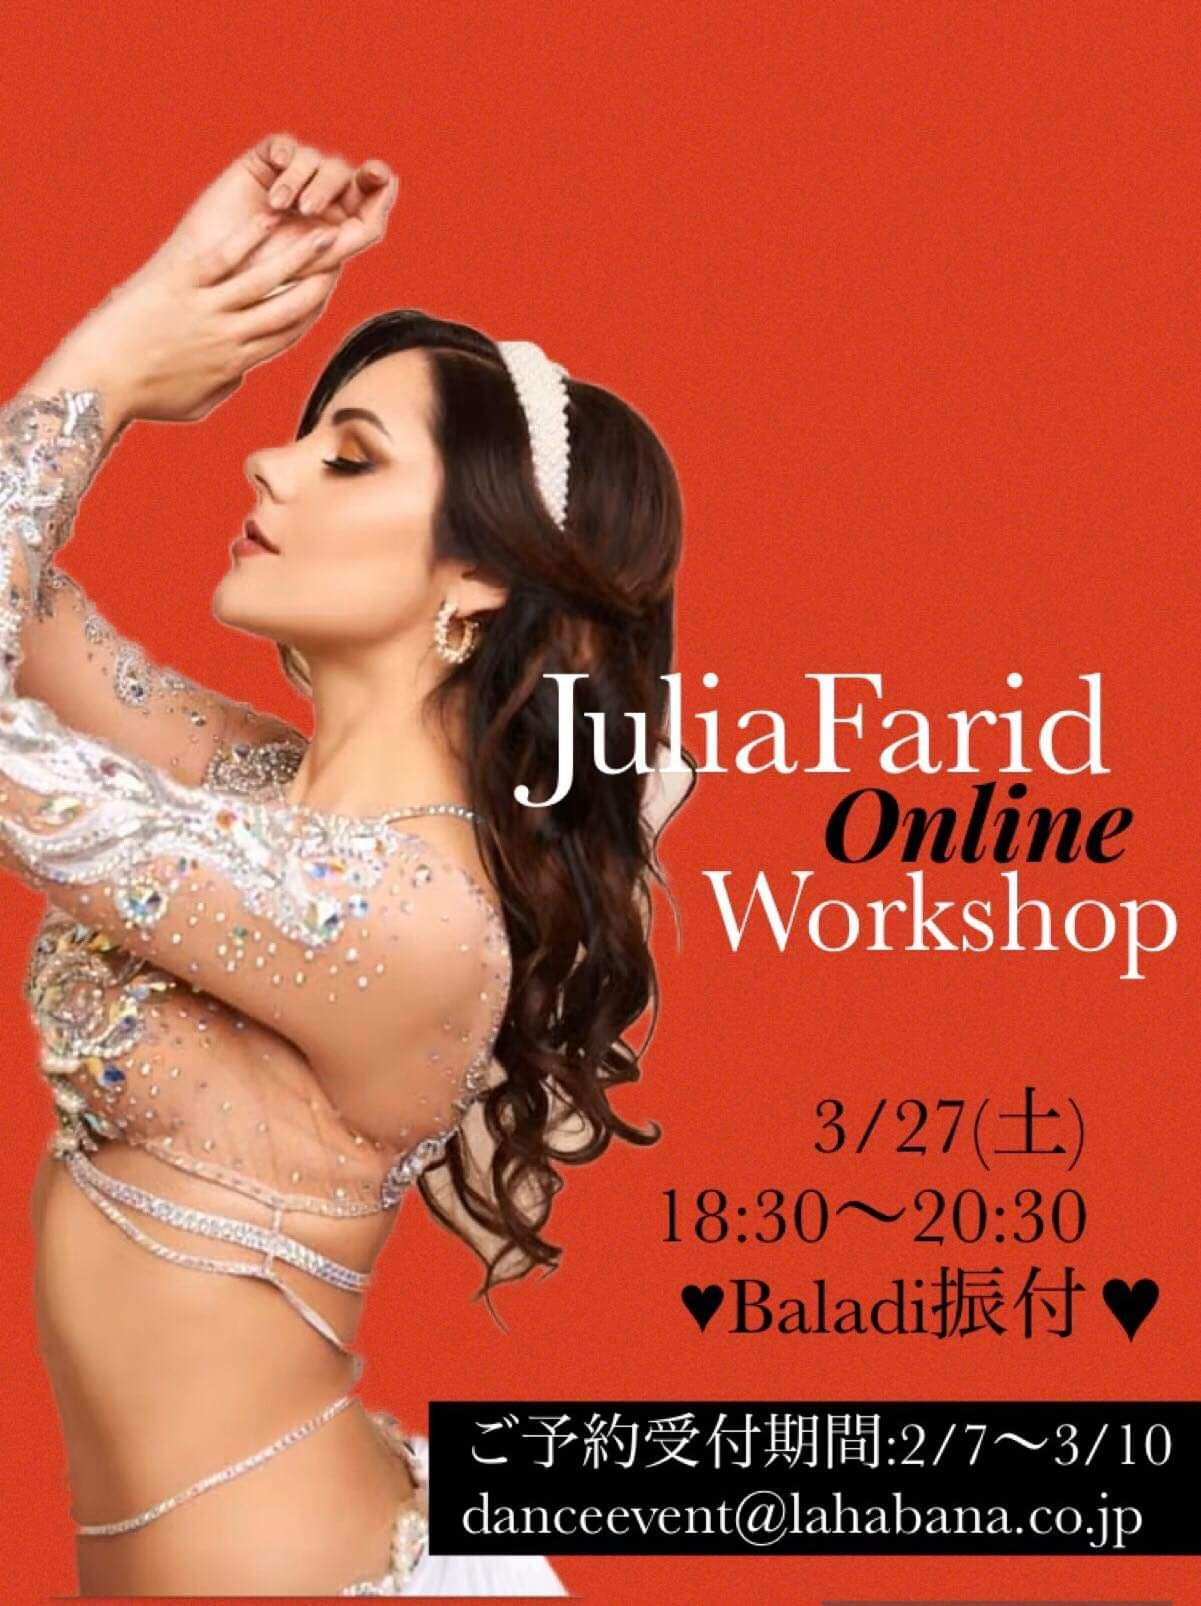 ★Julia Farid Online Workshop開催★